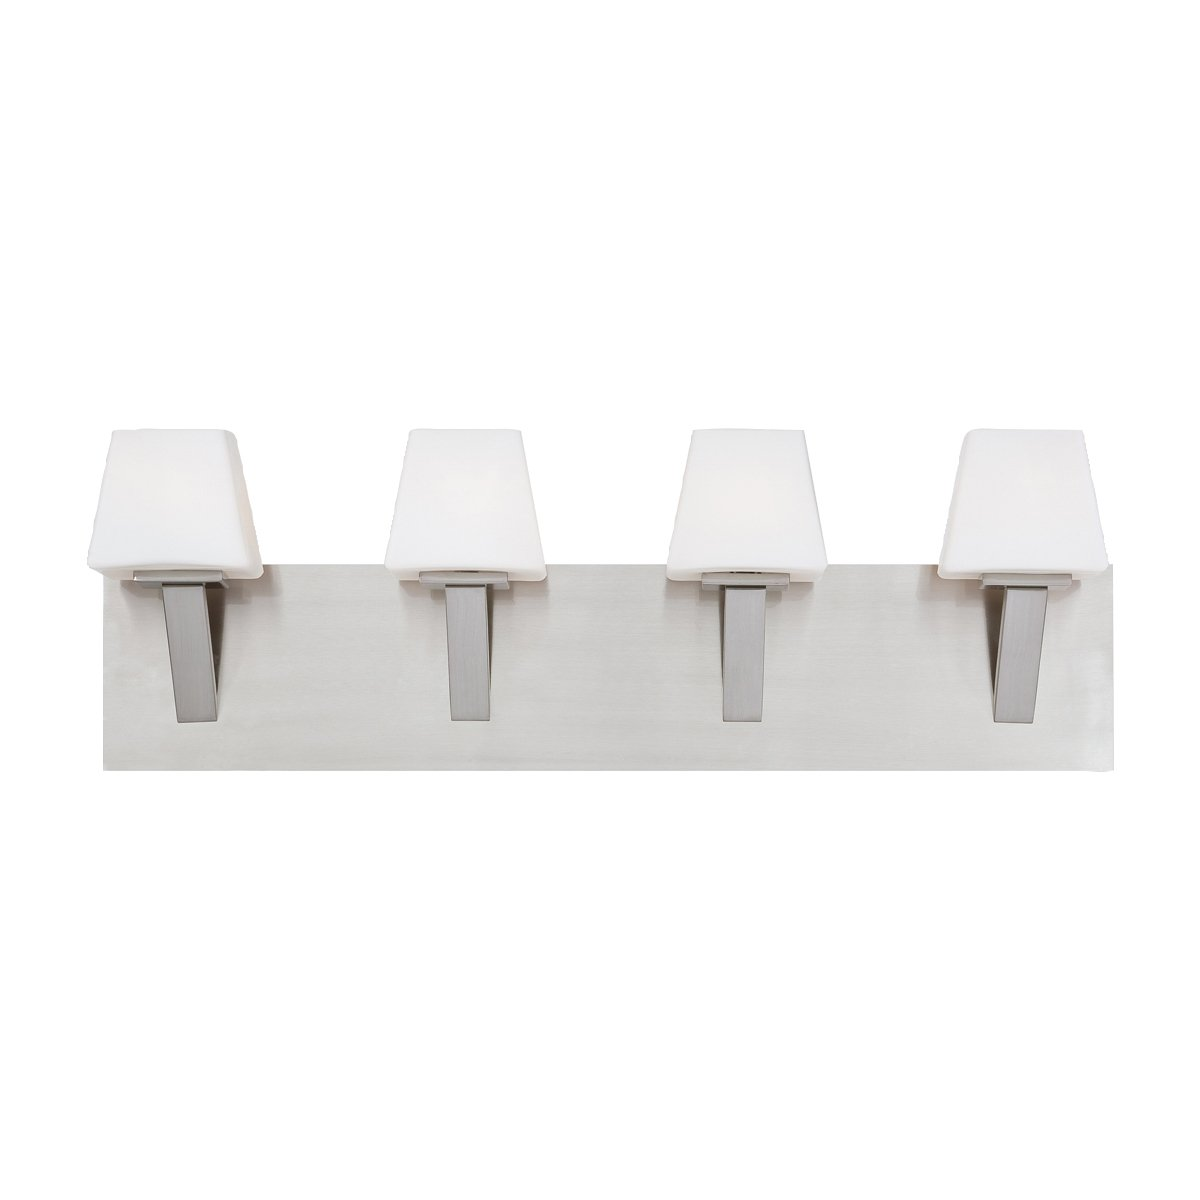 Eurofase 23043-022 Anglo 4-Light Bath Bar Bathroom Light Bulb, Satin Nickel by Eurofase  B007XAHMX8